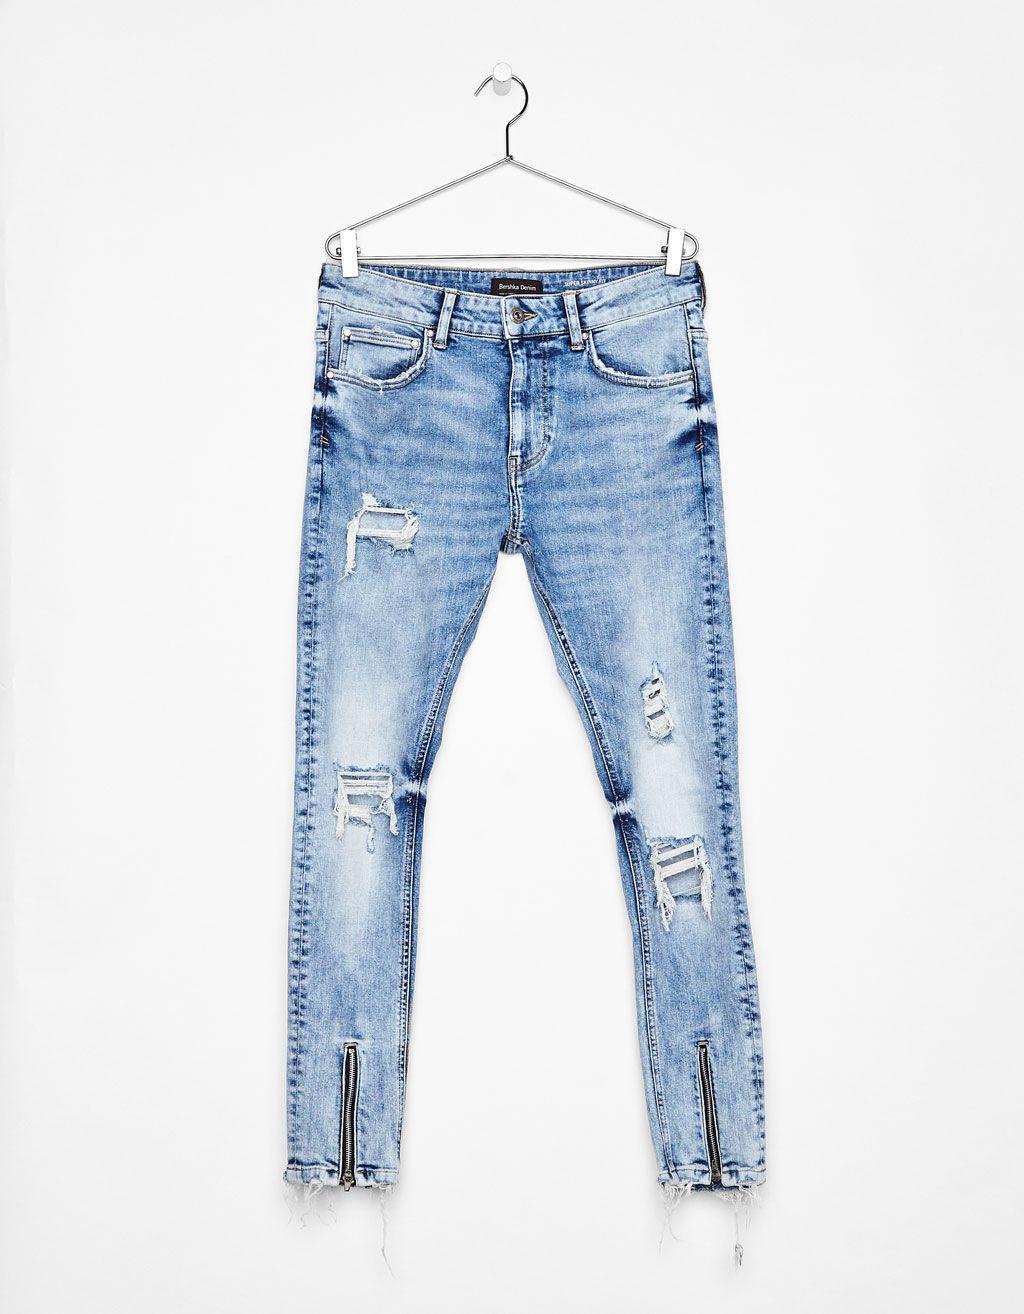 Jeans Super Skinny Fit Com Fechos De Correr Calcas De Ganga Bershka Portugal Jeans De Moda Pantalones De Moda Jeans Hombre